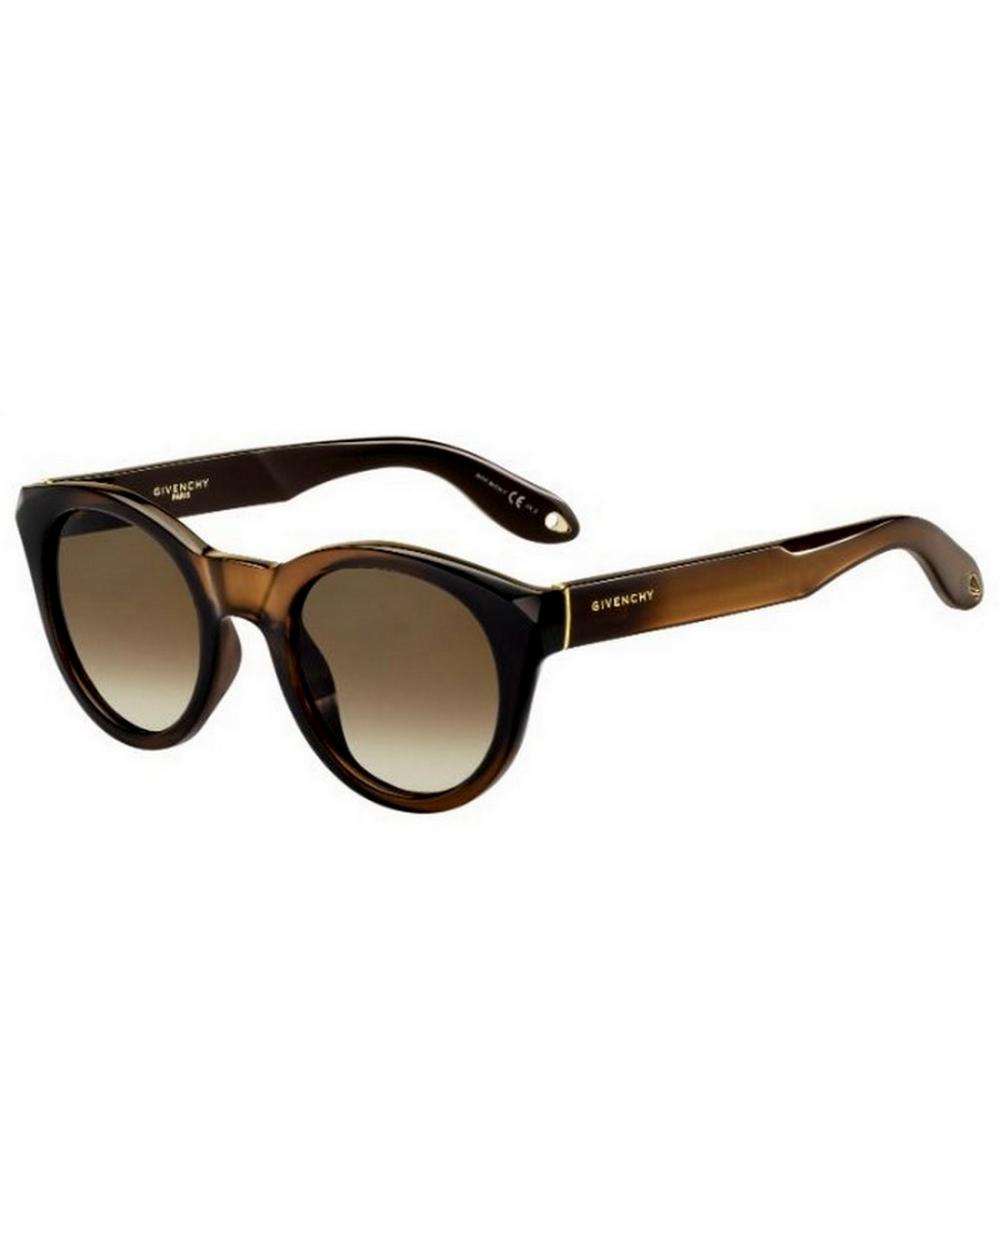 Sunglasses Givenchy GV 7003/s original package warranty italy